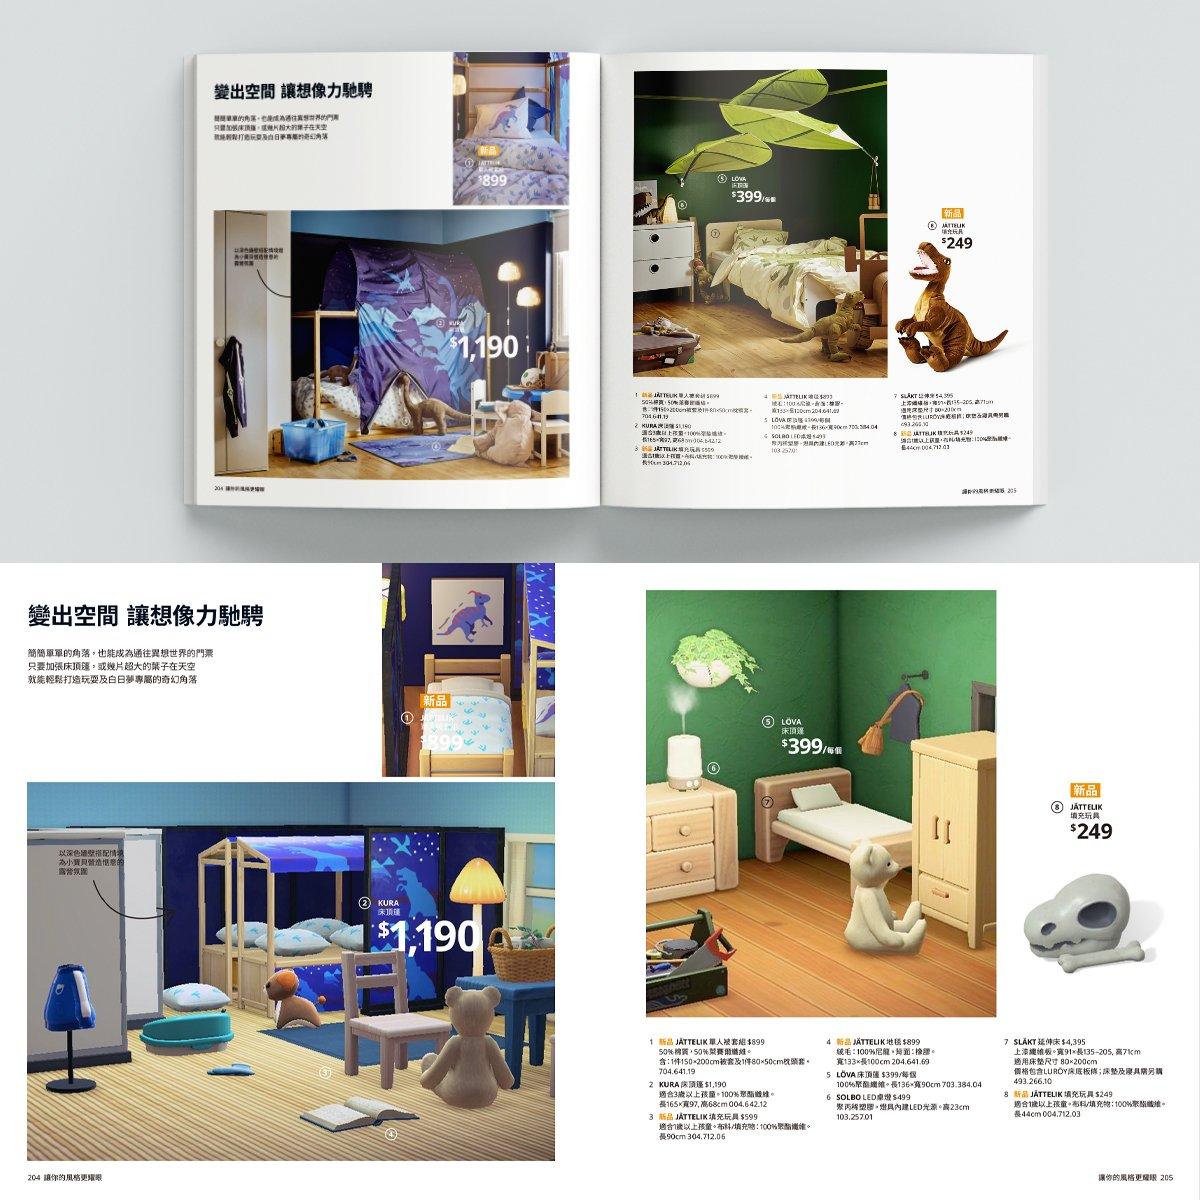 Thumbnail for IKEA Animal Crossing Catalogue